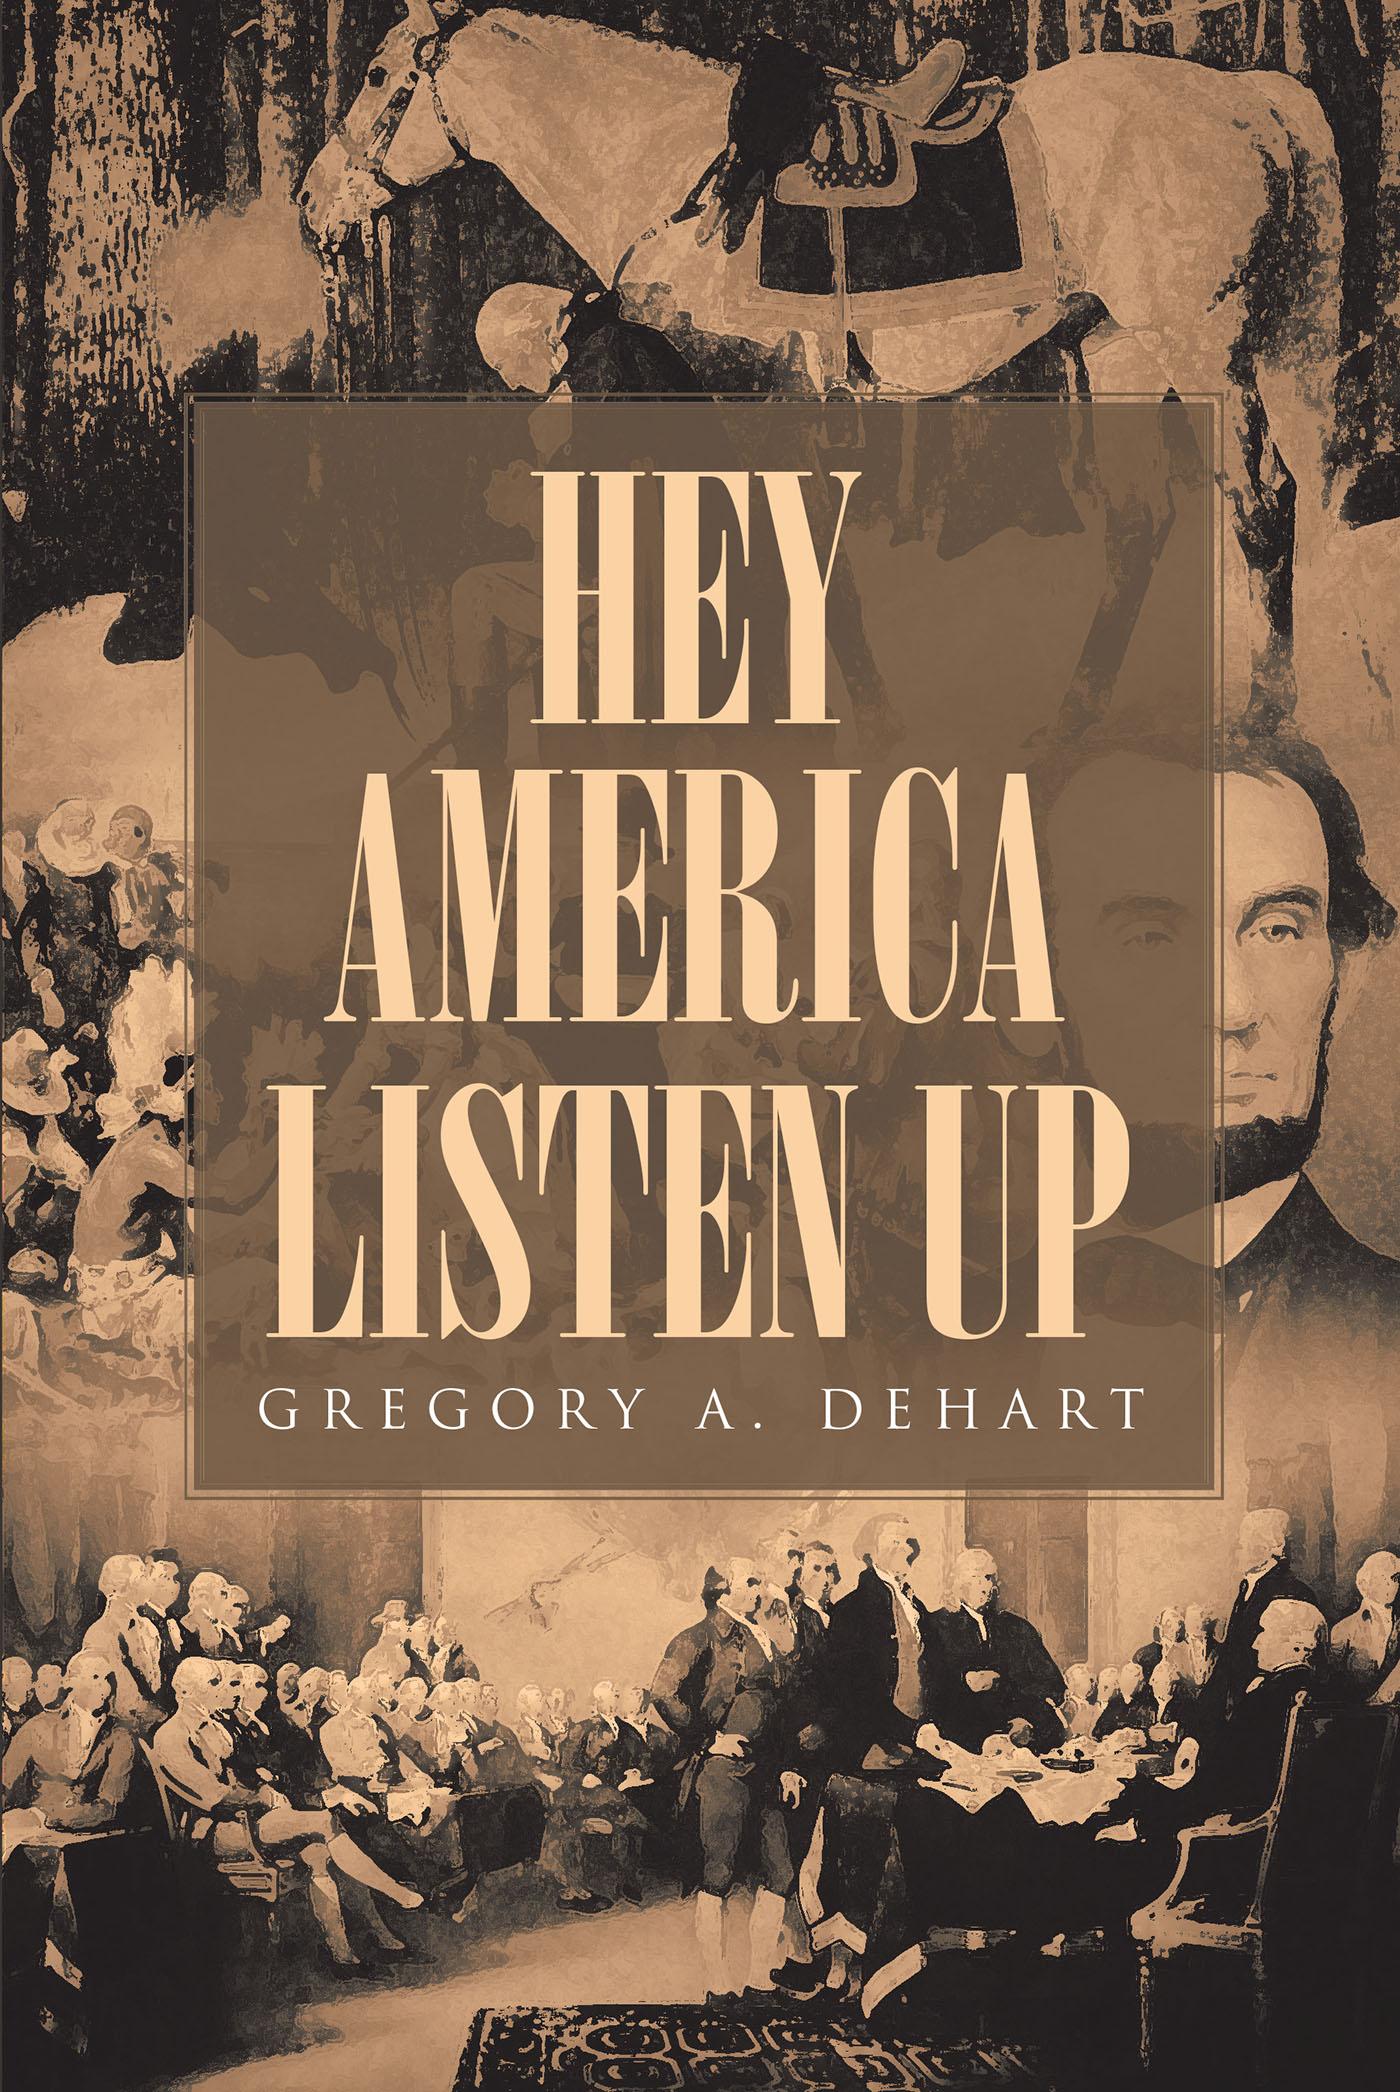 116f76fc1 Hey America Listen Up